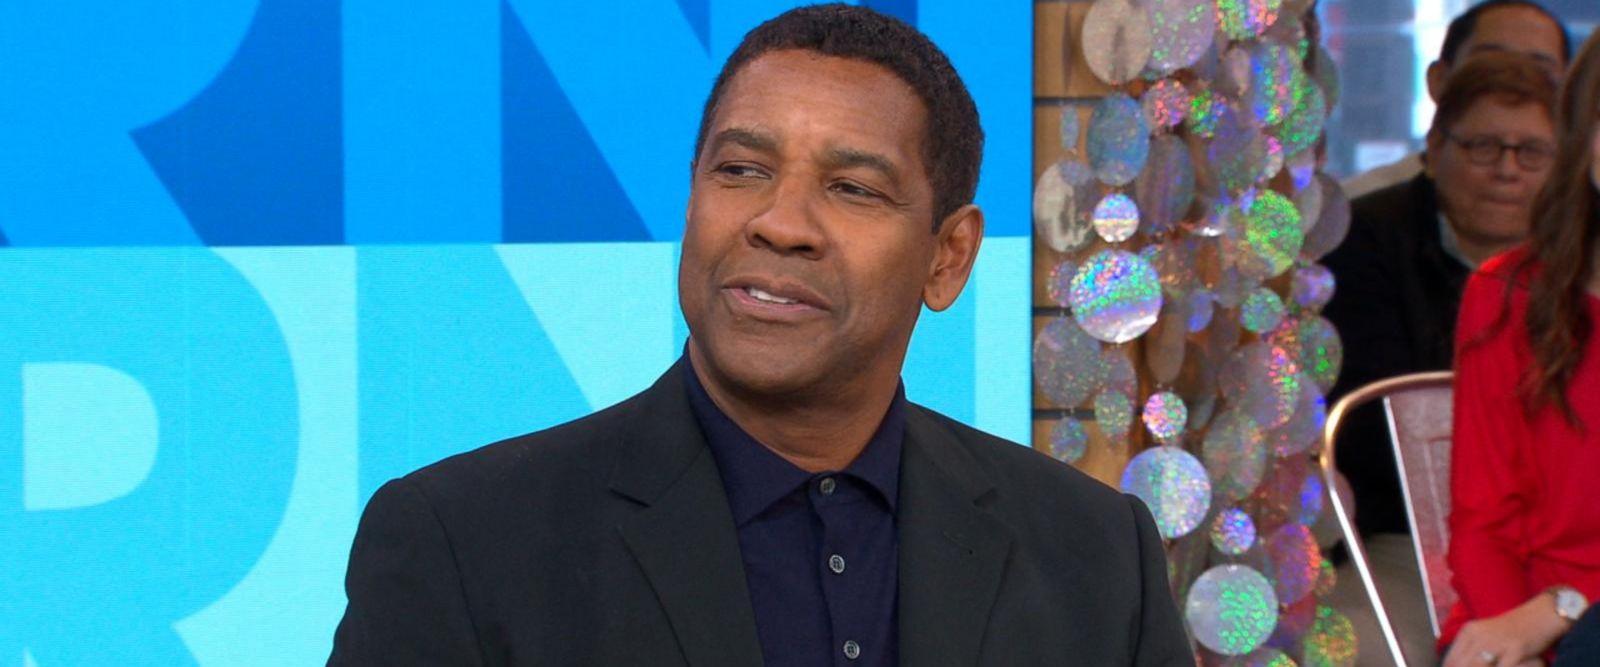 VIDEO: Garth Brooks gushes over latest Denzel Washington movie